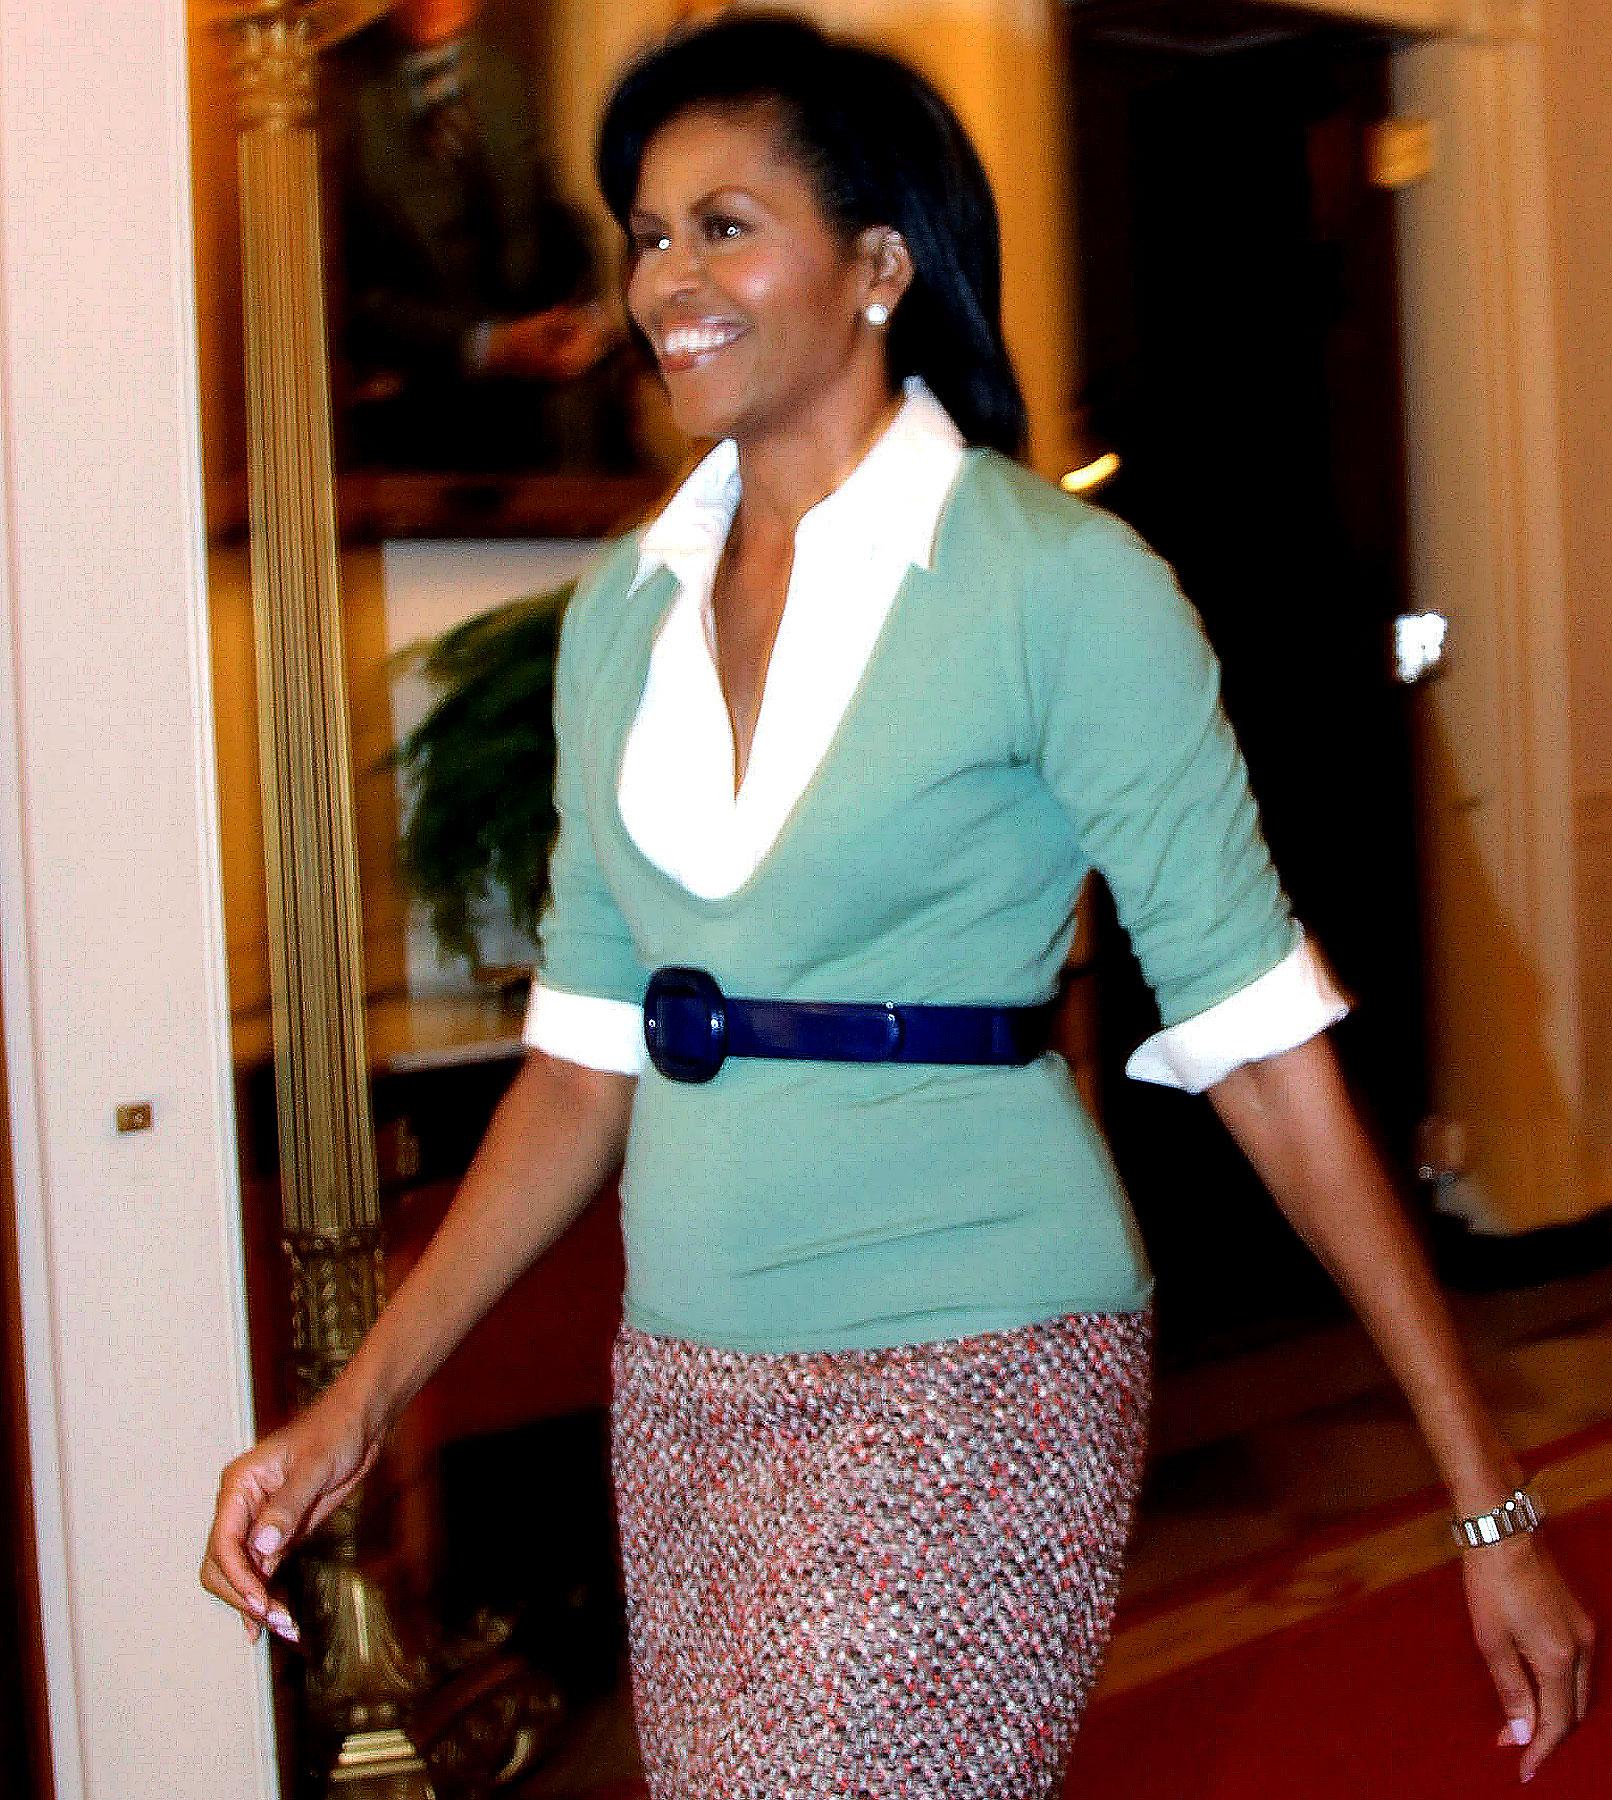 President Obama Tries to Trim First Lady's Closet